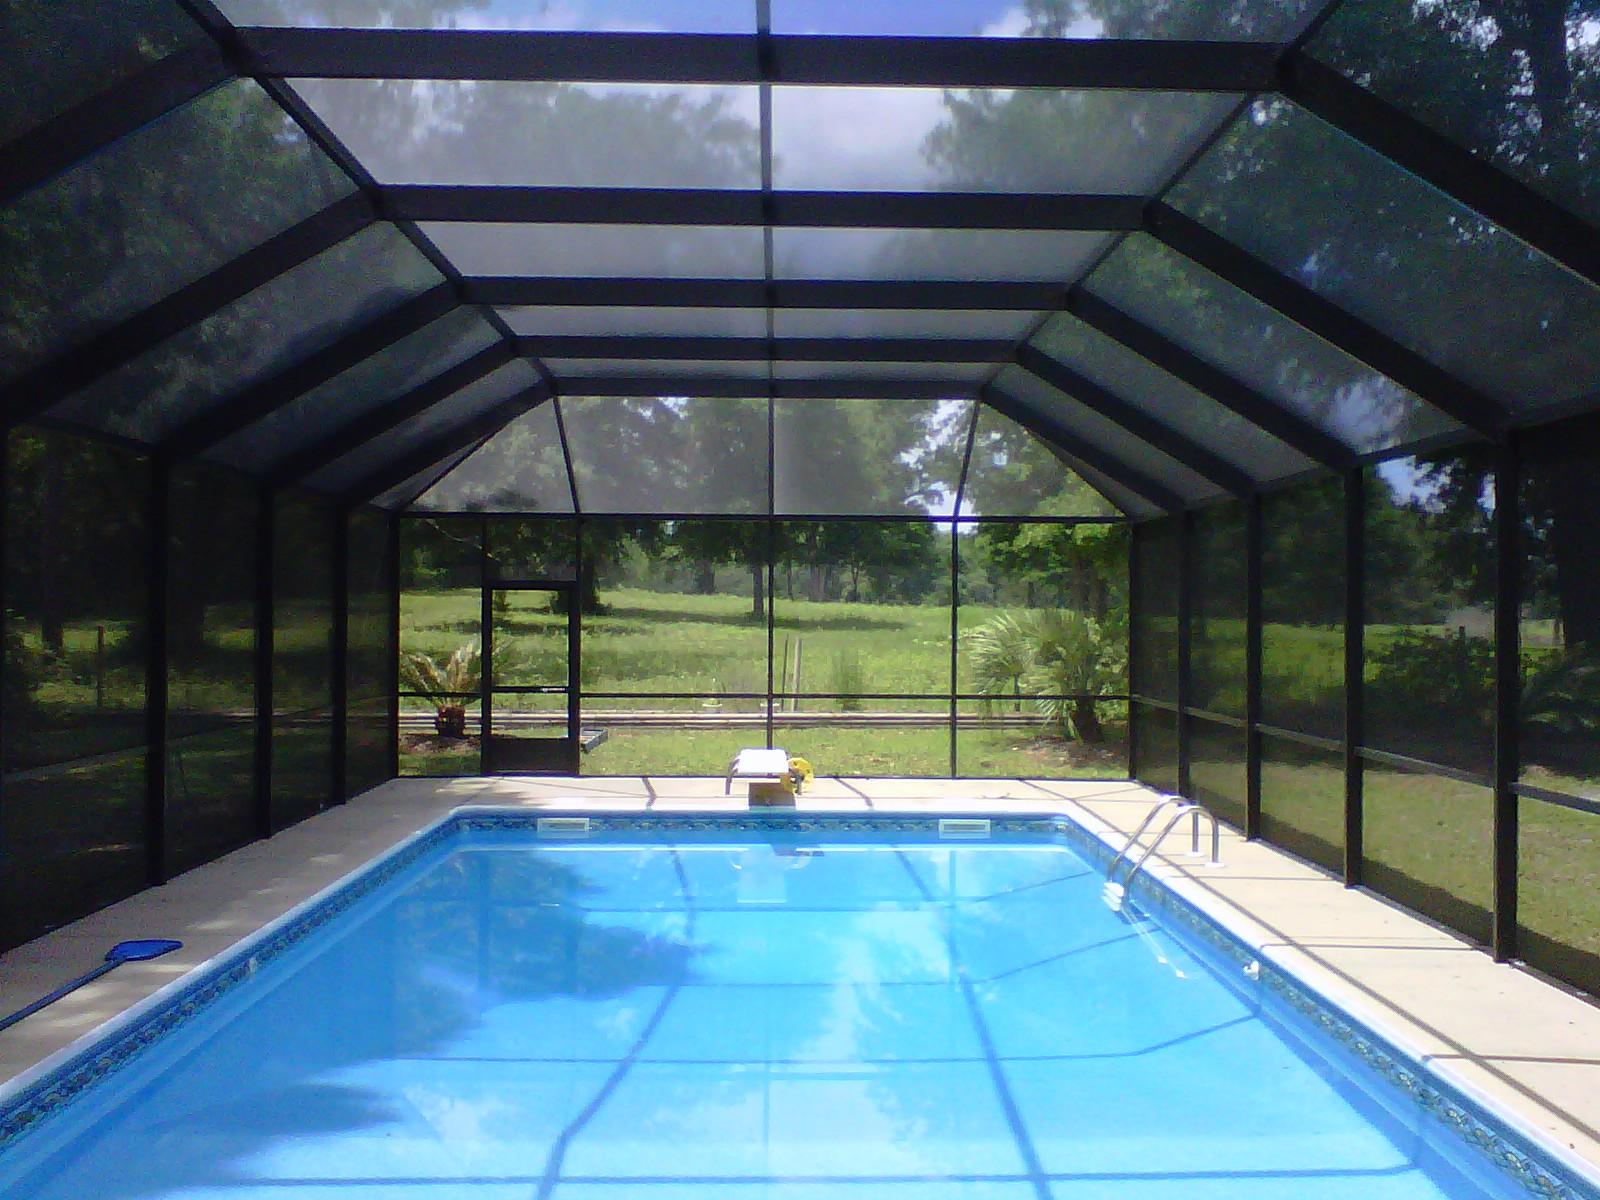 Pool Enclosures Usa Crawfordville Florida Pool Enclosure